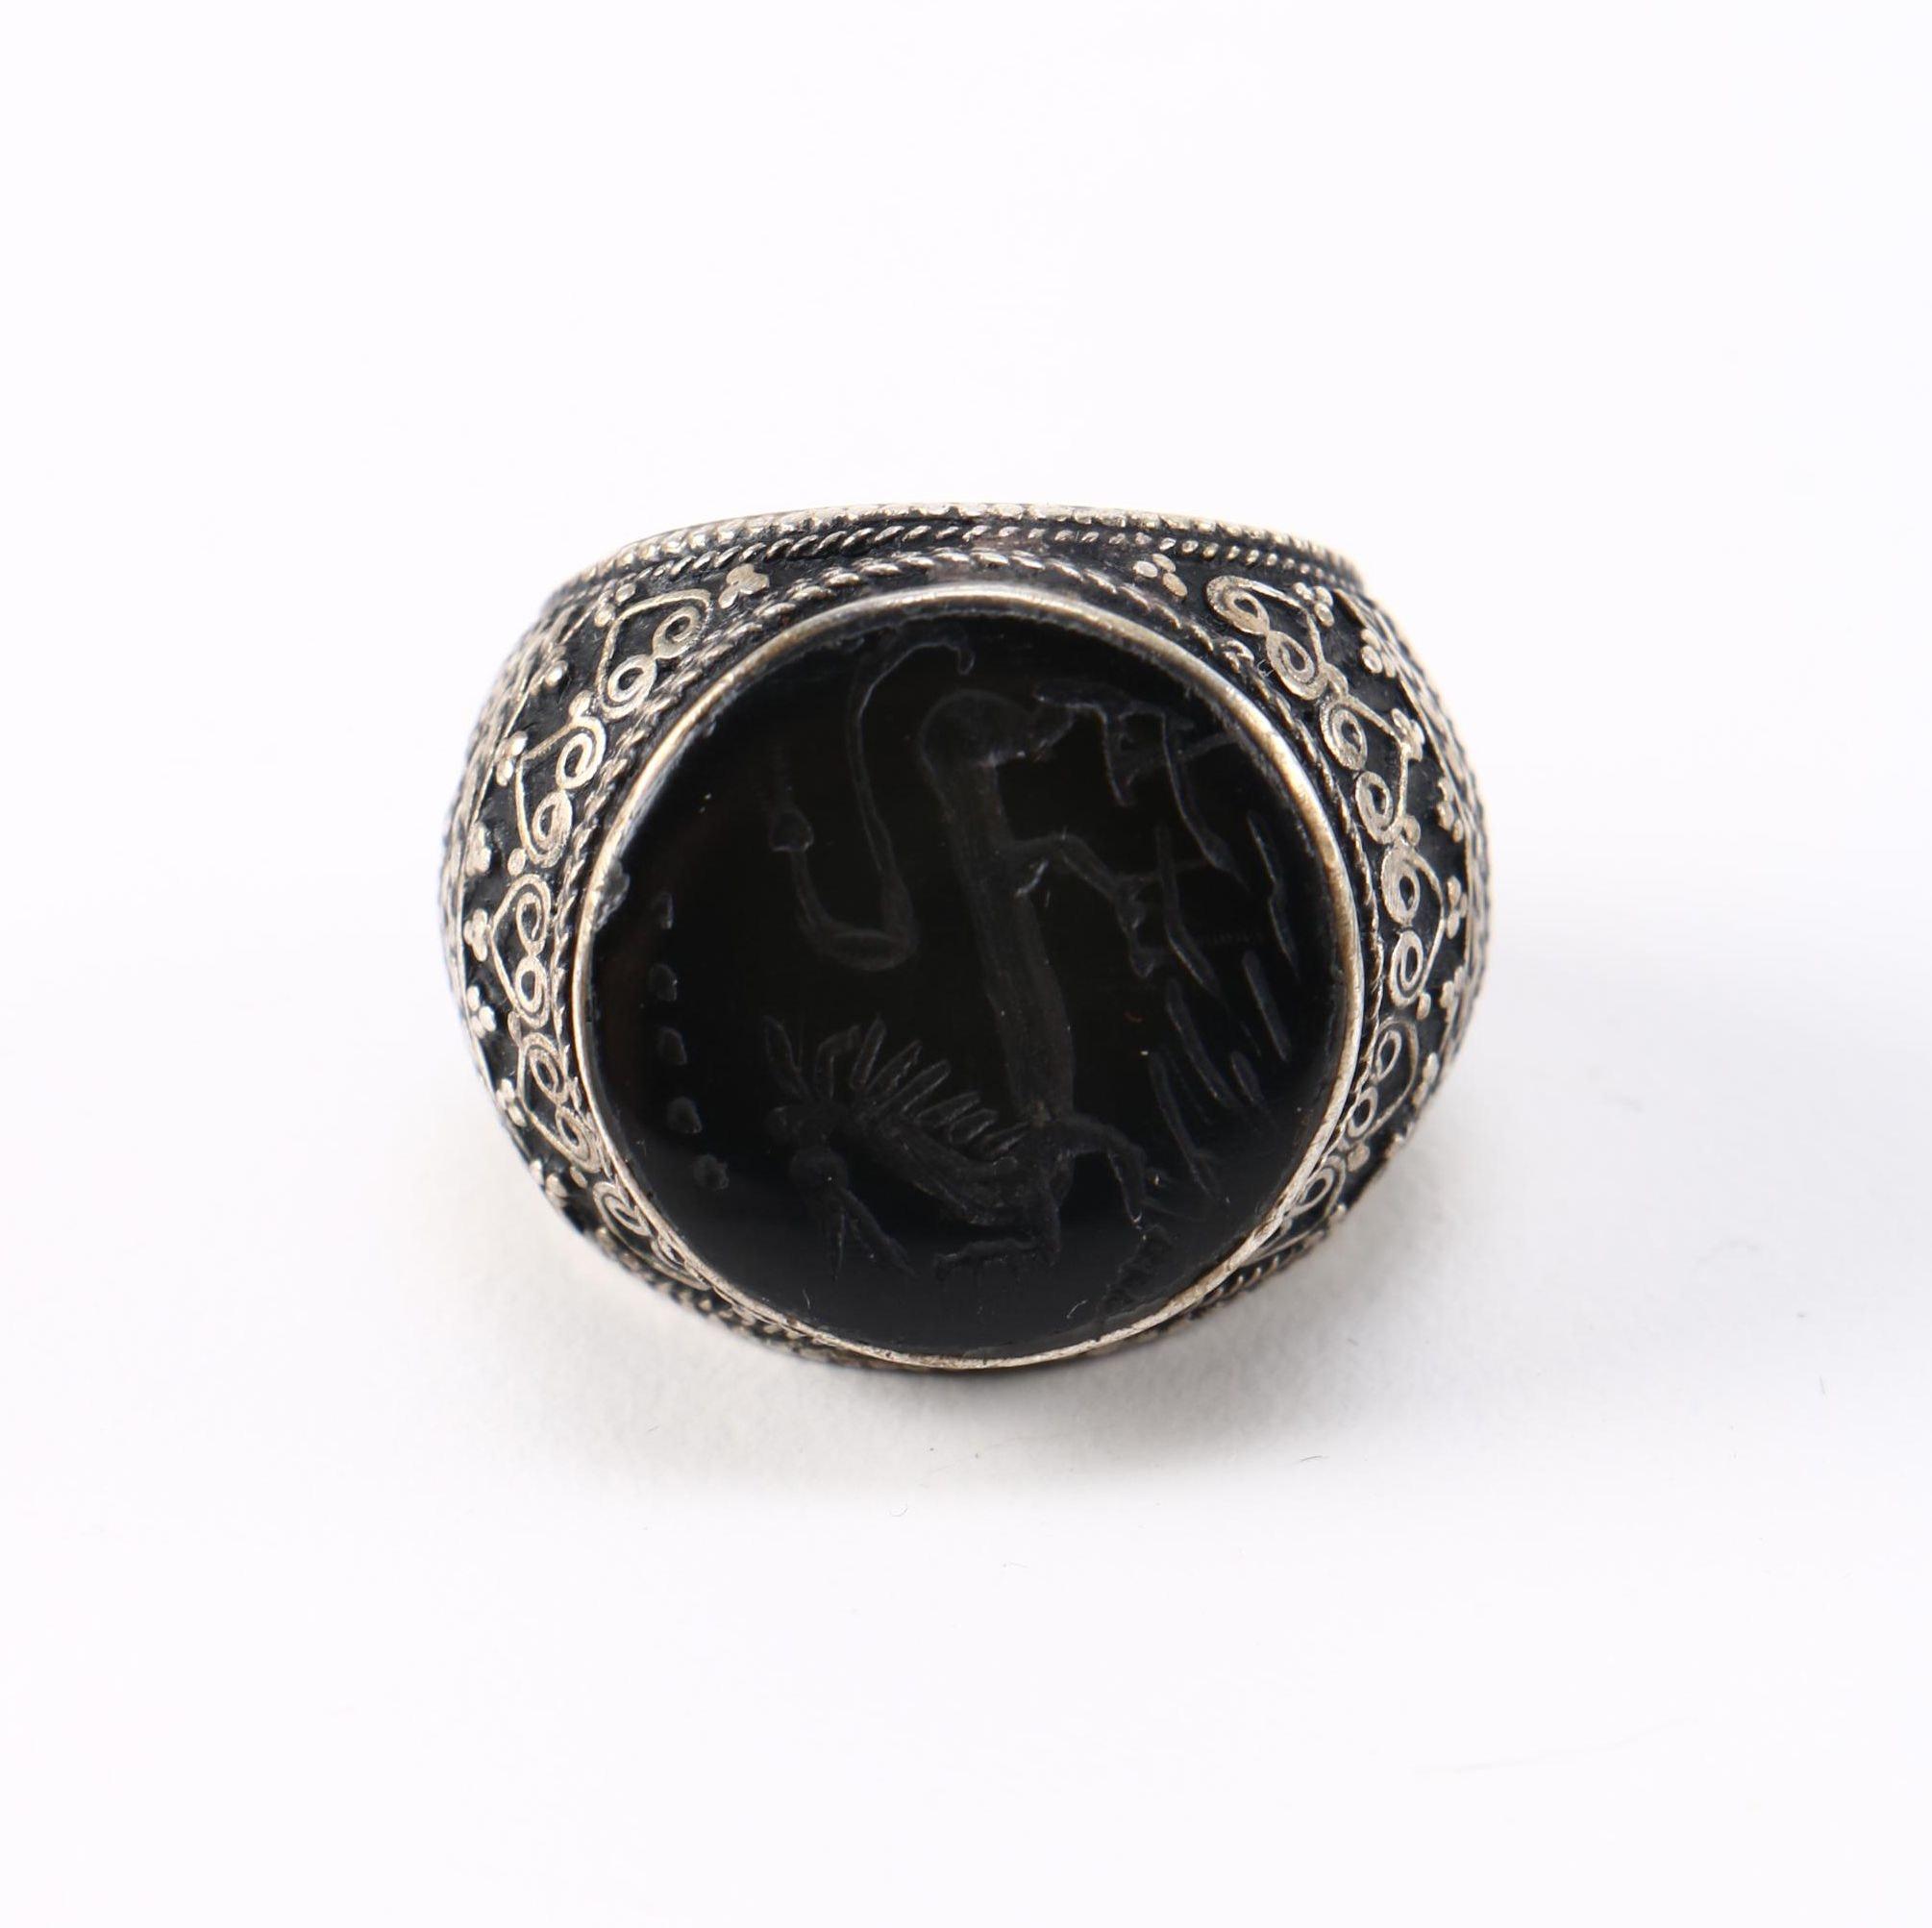 Ornate Black Onyx Ring